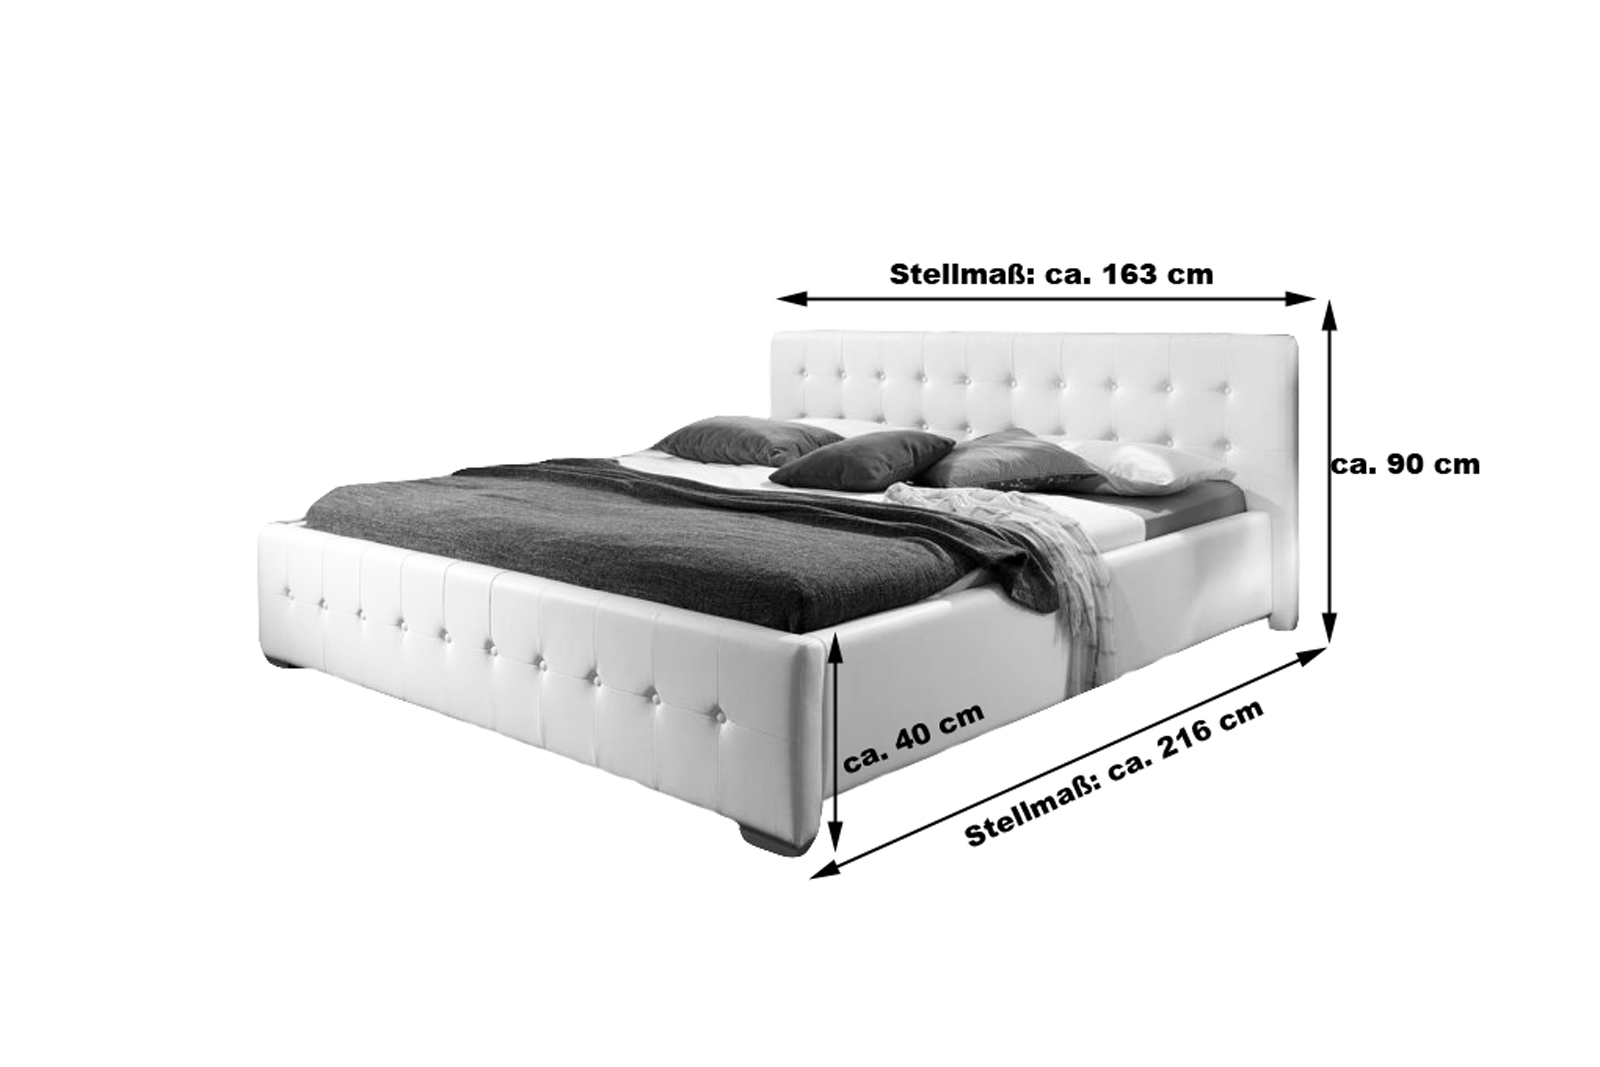 sam® polster bett 140 x 200 cm weiß rimini günstig, Hause deko